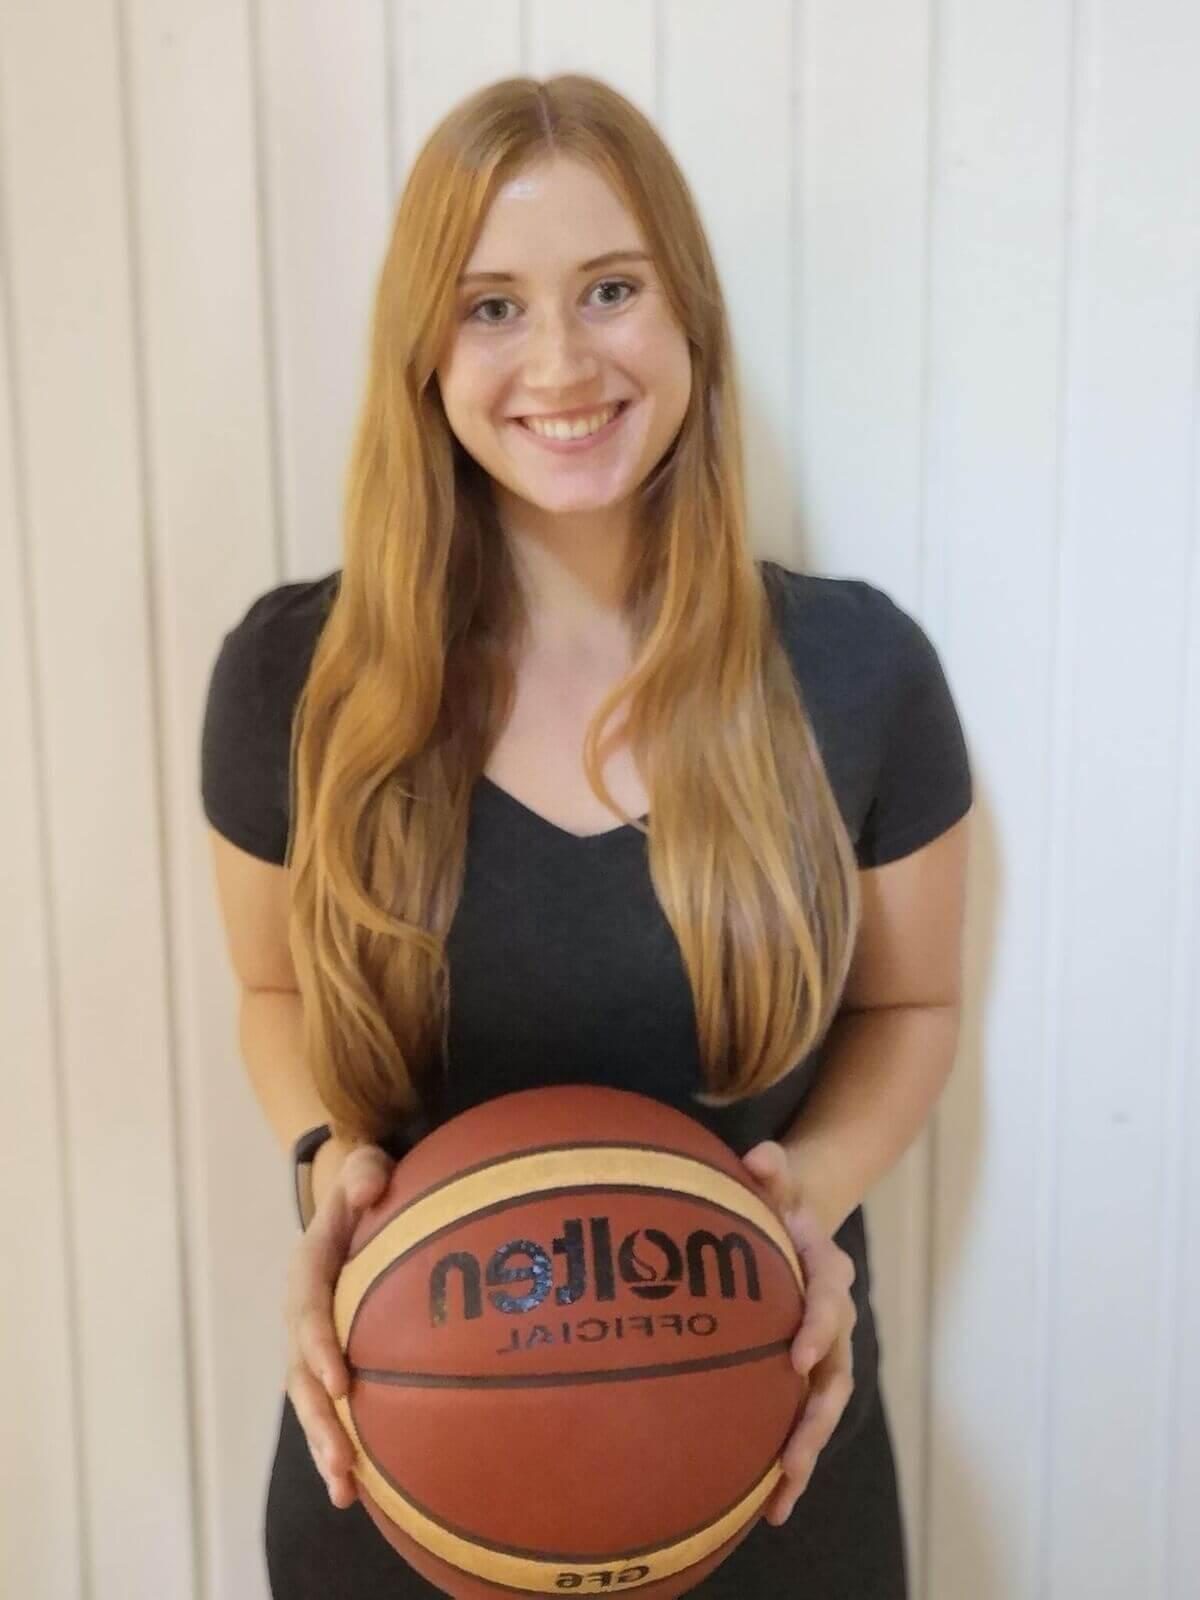 Die duale Studentin Claudia spielt Basketball in Renés Mannschaft.